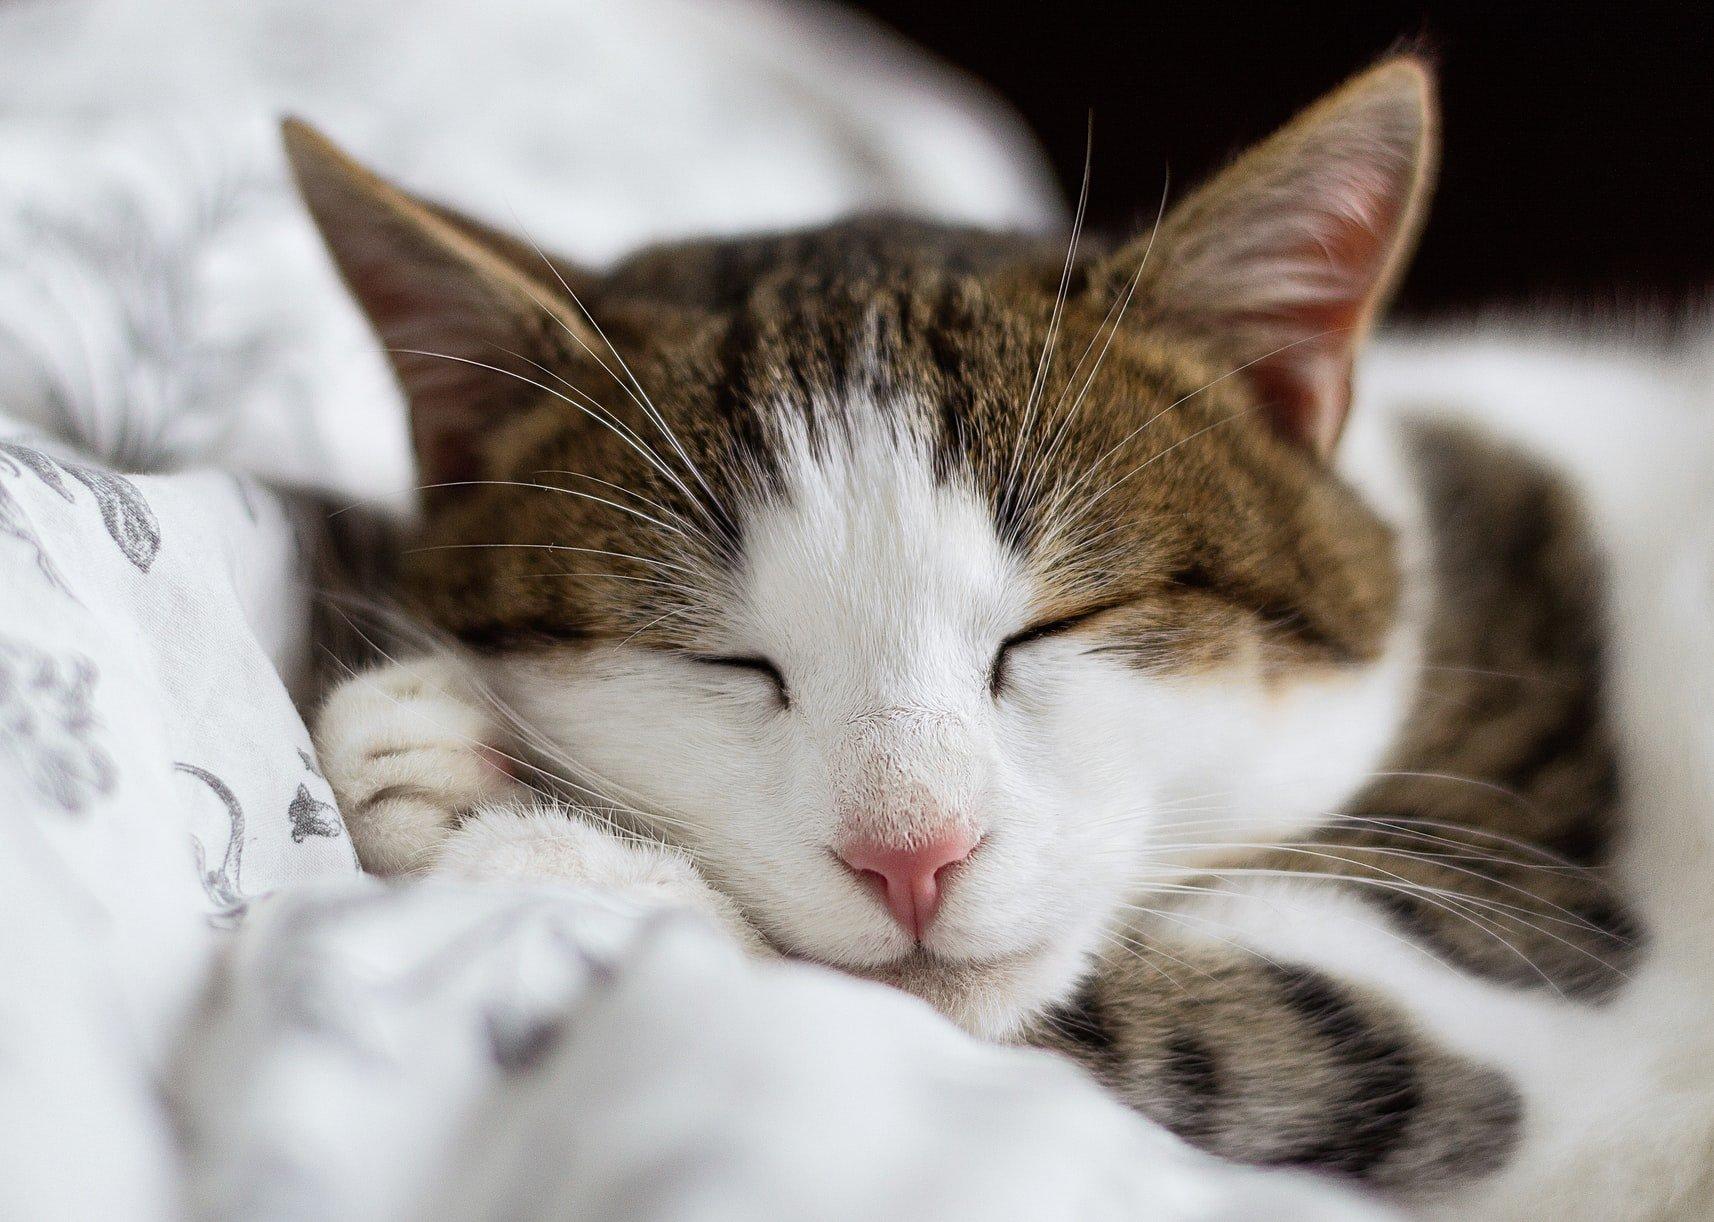 cat meowing in sleep